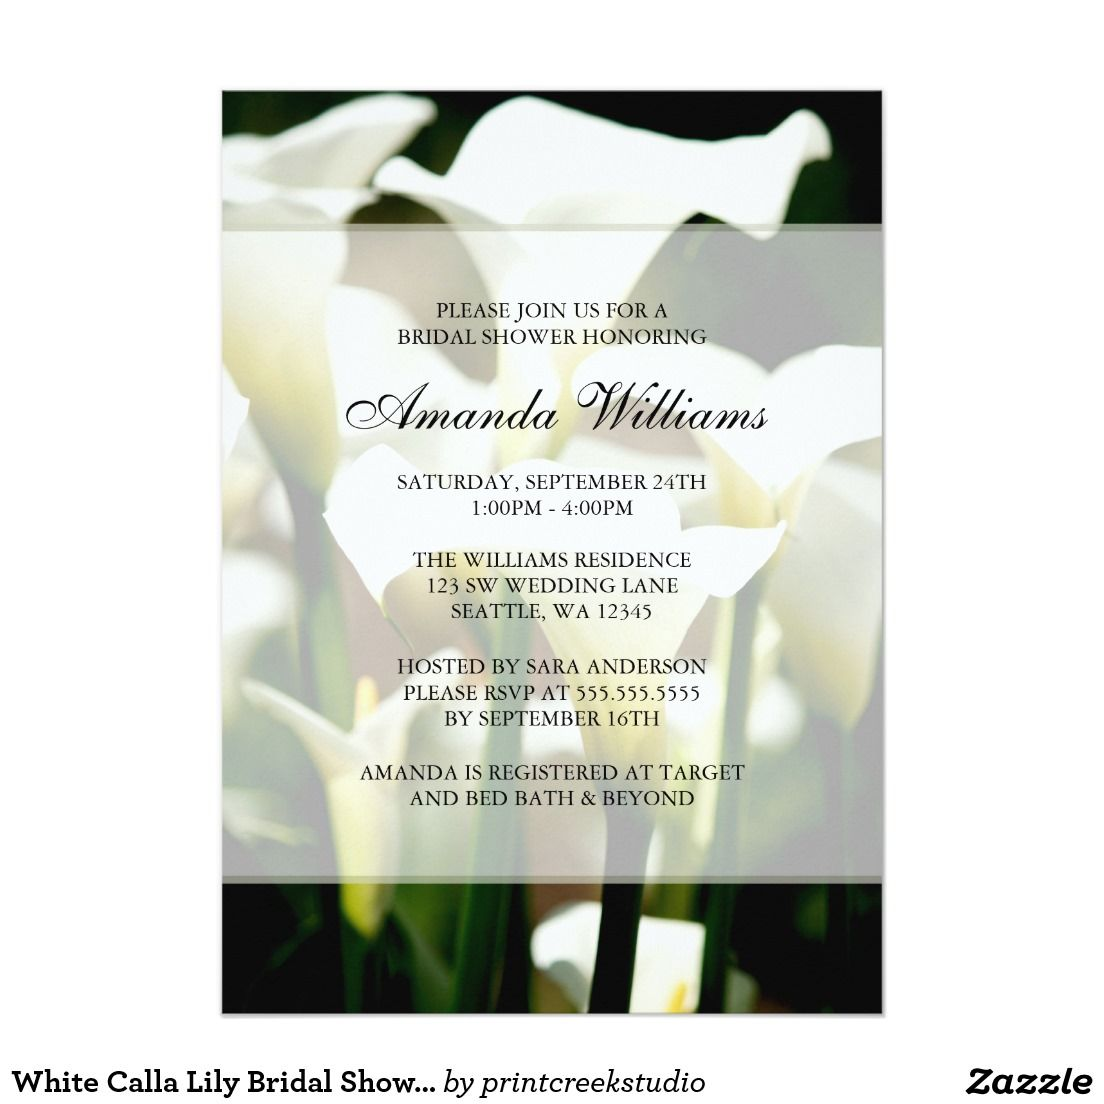 White Calla Lily Bridal Shower Invitations   Bridal Shower paper ...